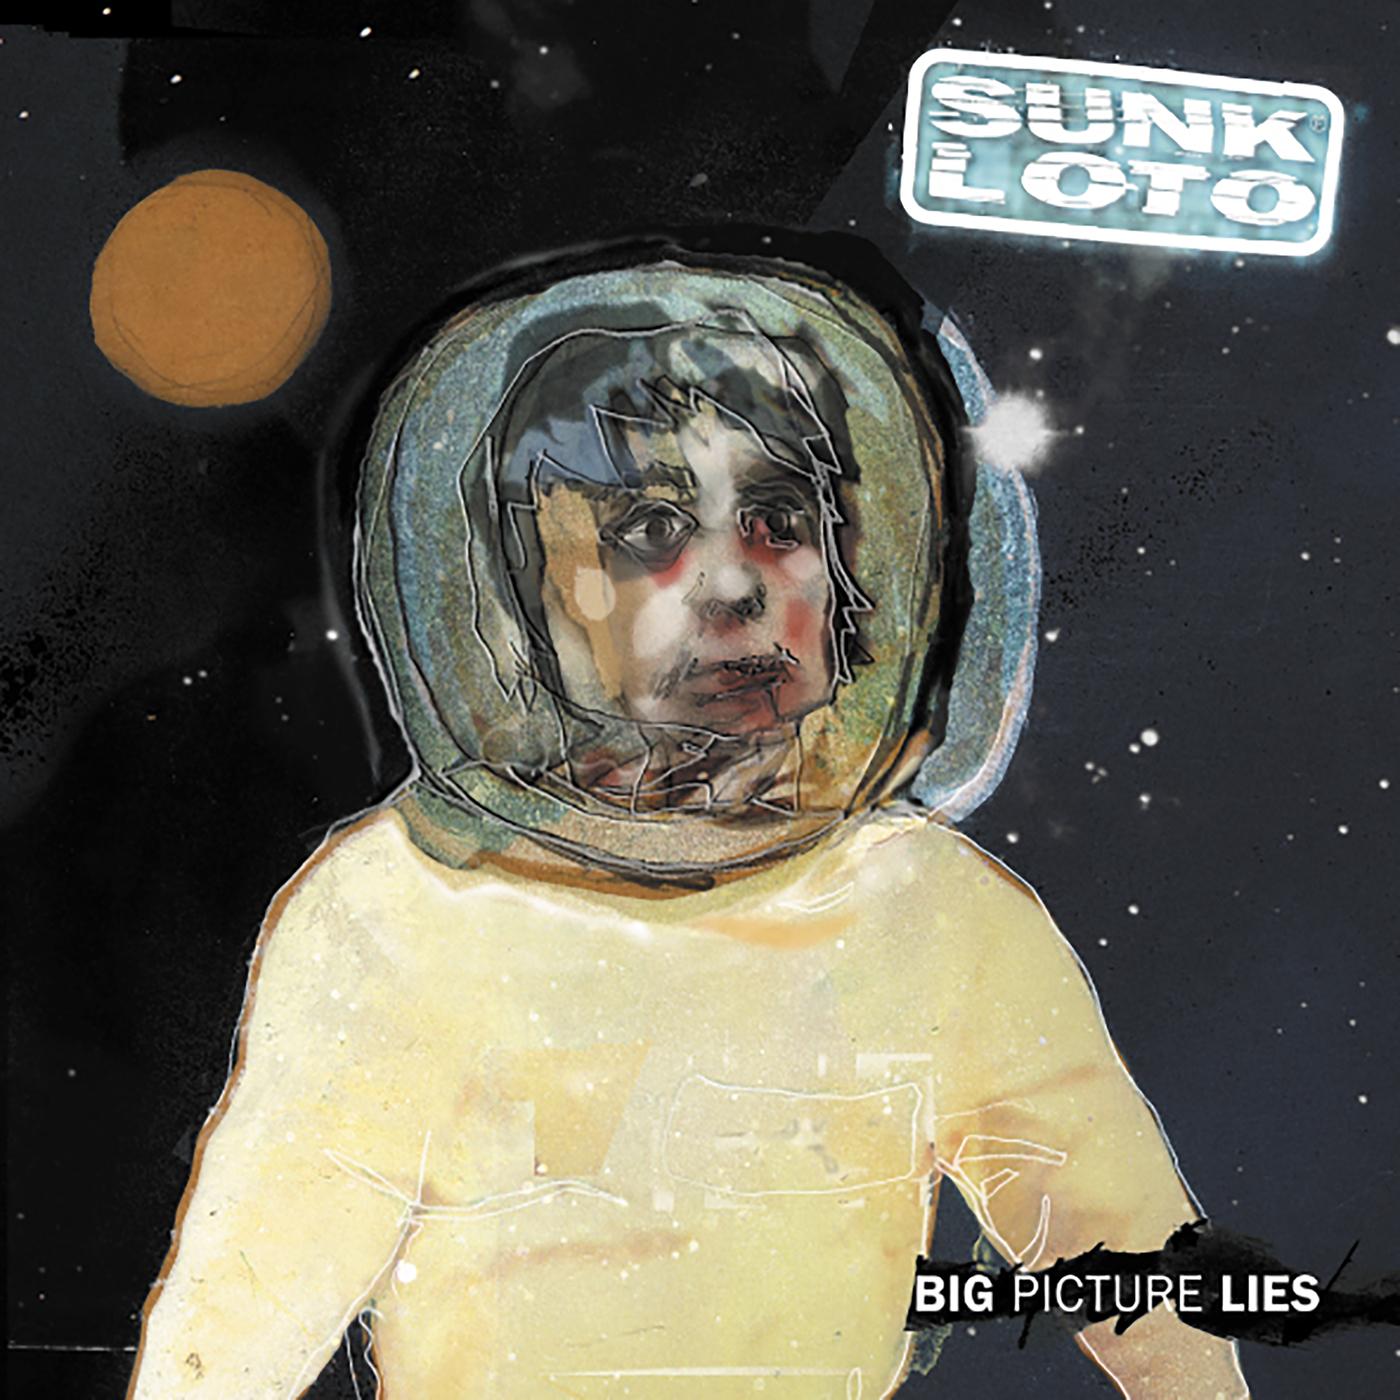 Big Picture Lies - Sunk Loto